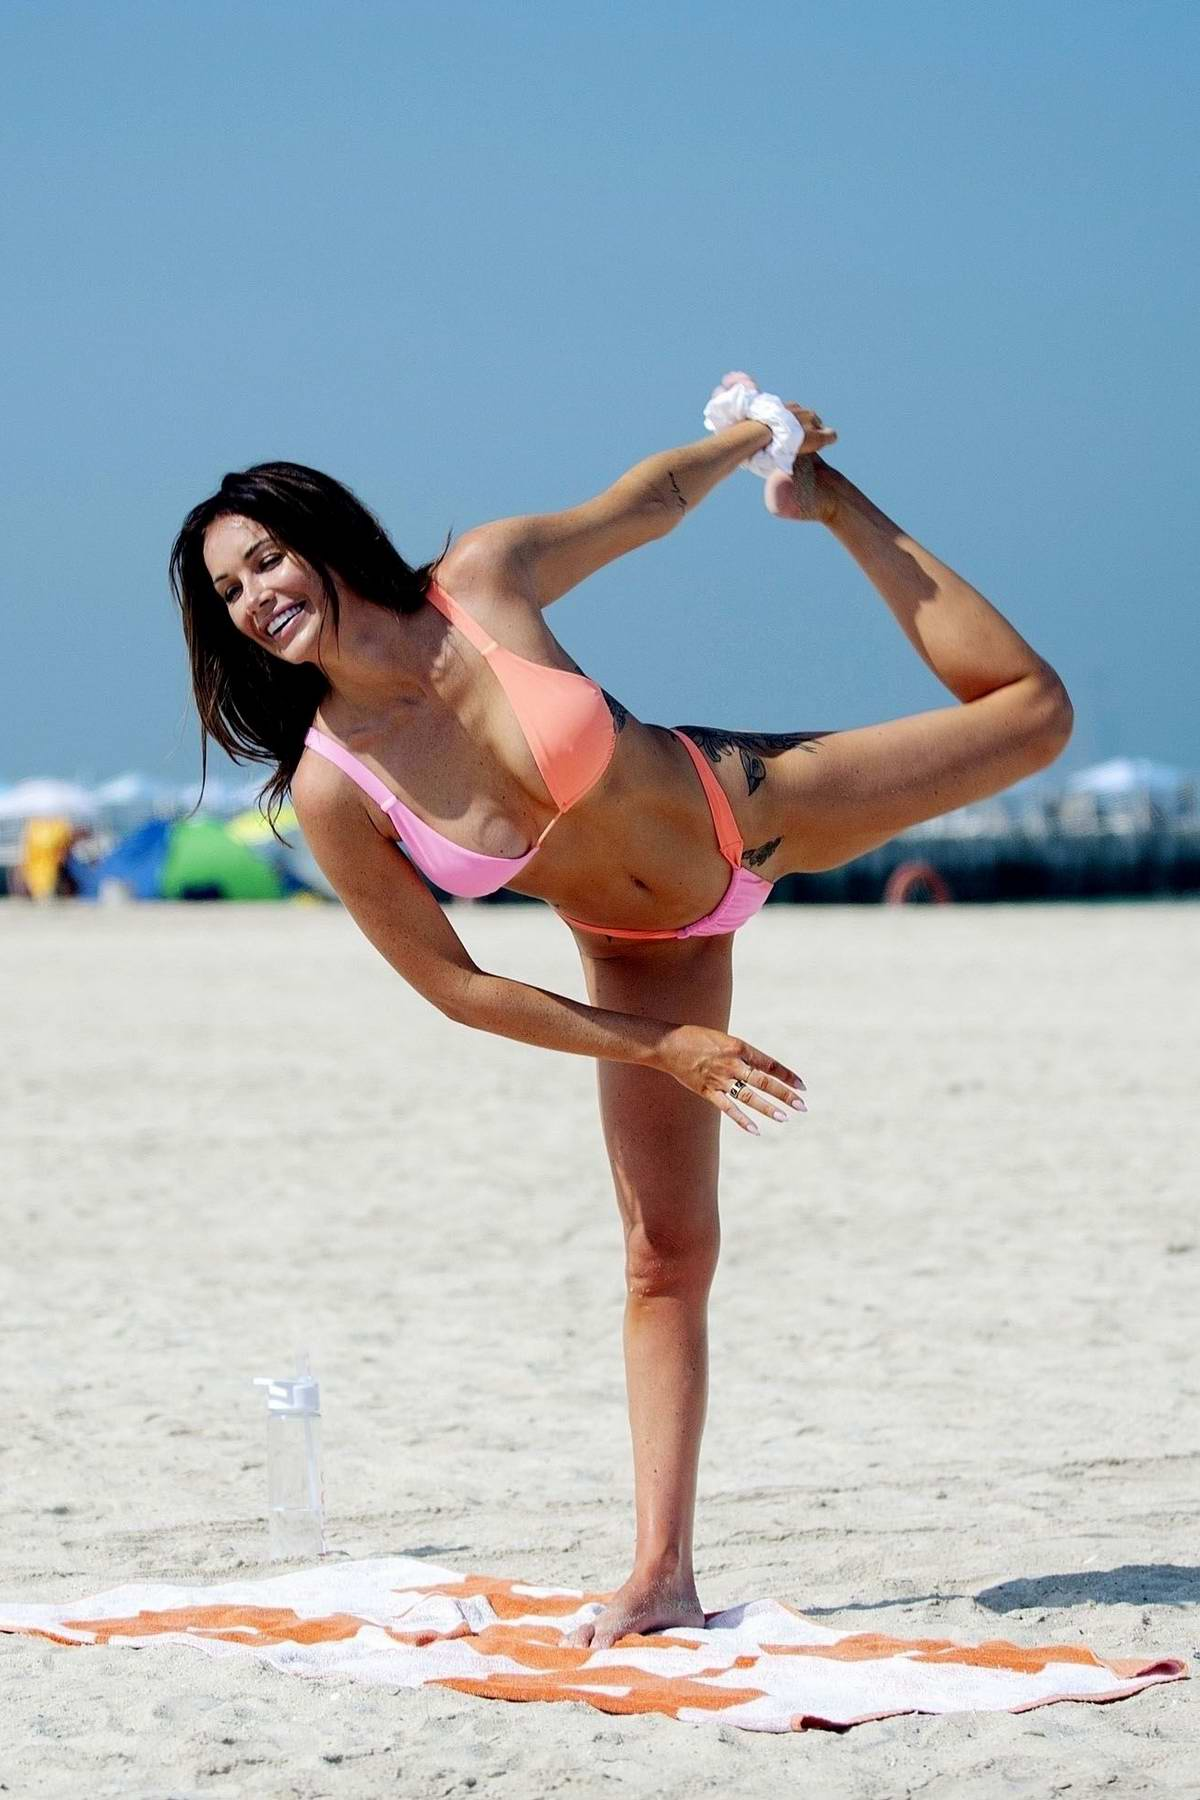 Laura Anderson wears a two-toned pink and orange bikini during a beach yoga session in Dubai, UAE